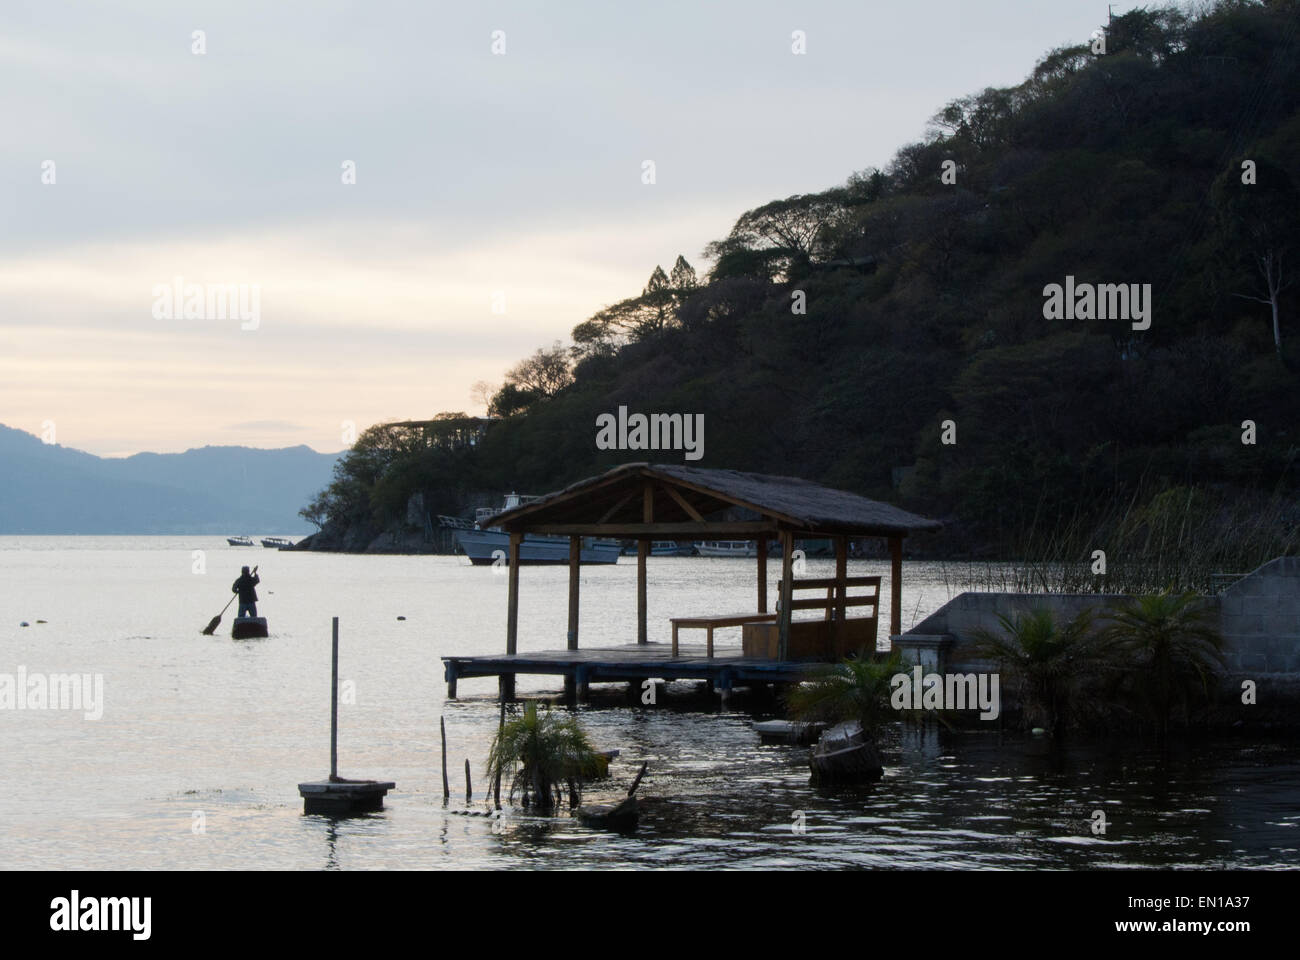 Sunset over the Lago de Atitlan, Guatemala - Stock Image